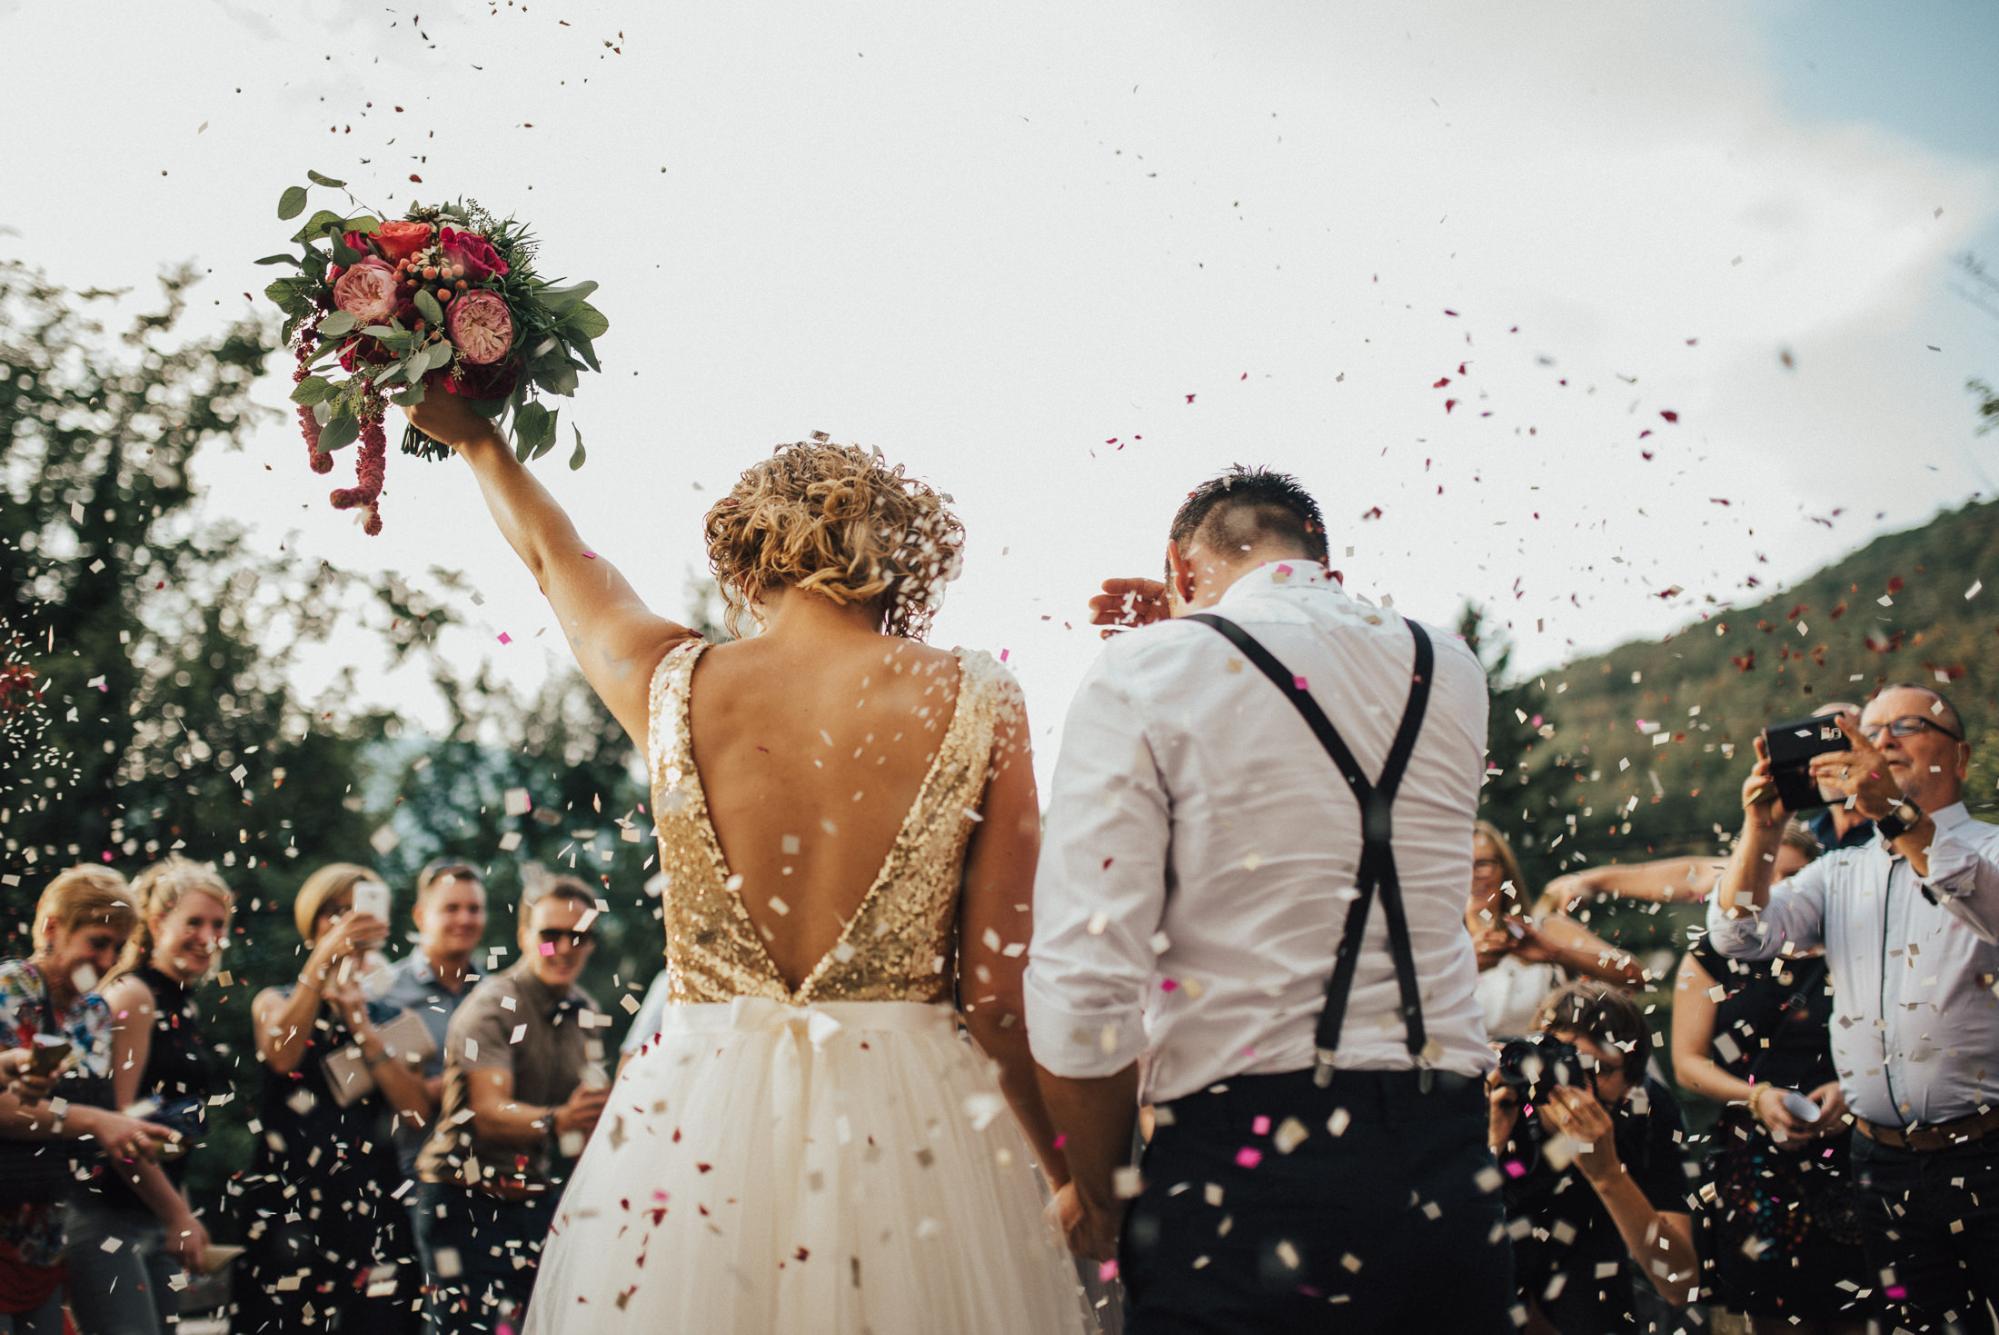 Perfectly Creative Wedding Hashtags on Instagram